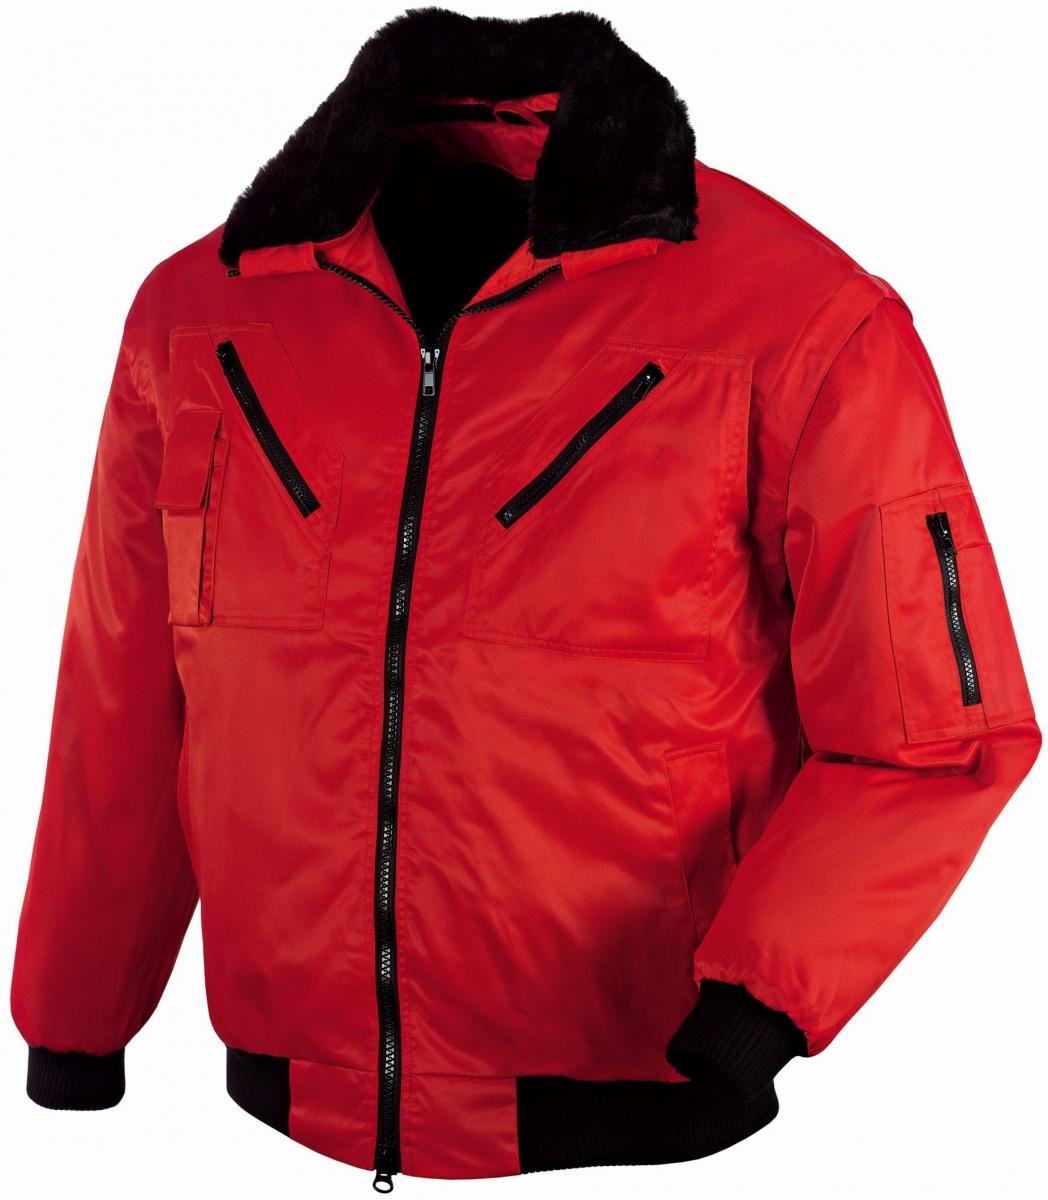 BIG-TEXXOR-Kälte-Schutz, Winter-Arbeits-Berufs-Piloten-Jacke, Oslo, rot